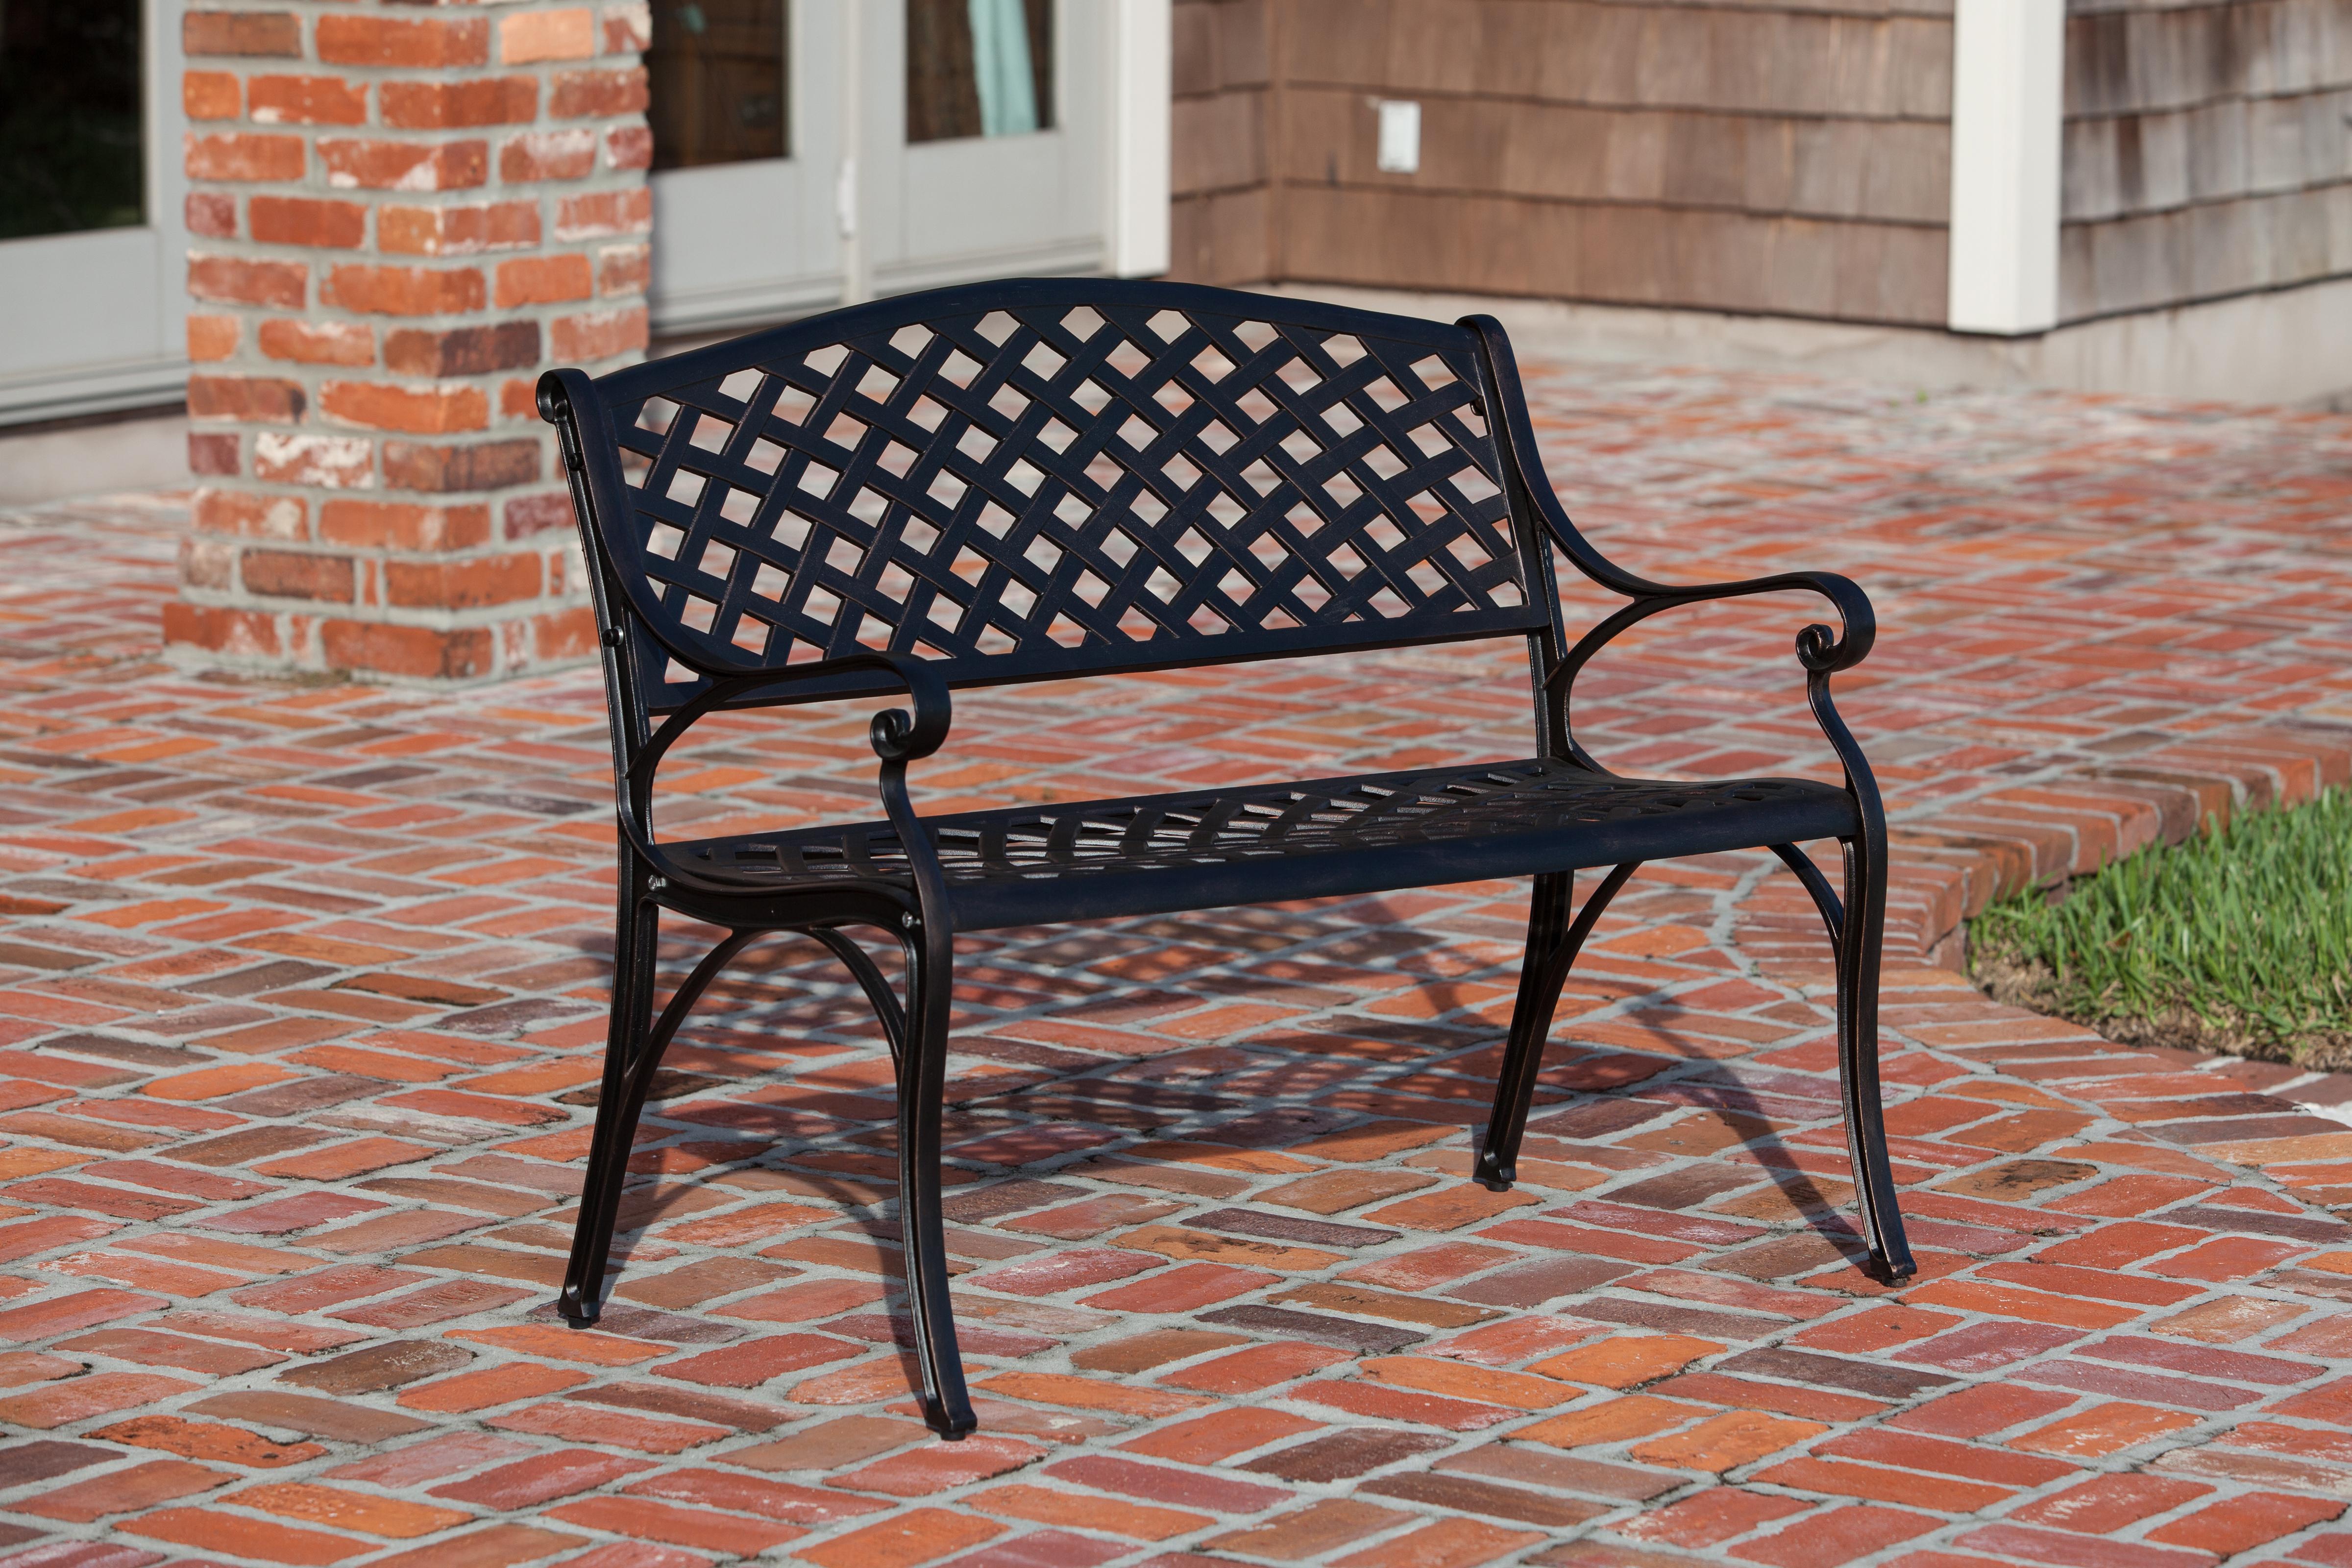 Antique Bronze Cast Aluminum Patio Bench Well Traveled Living